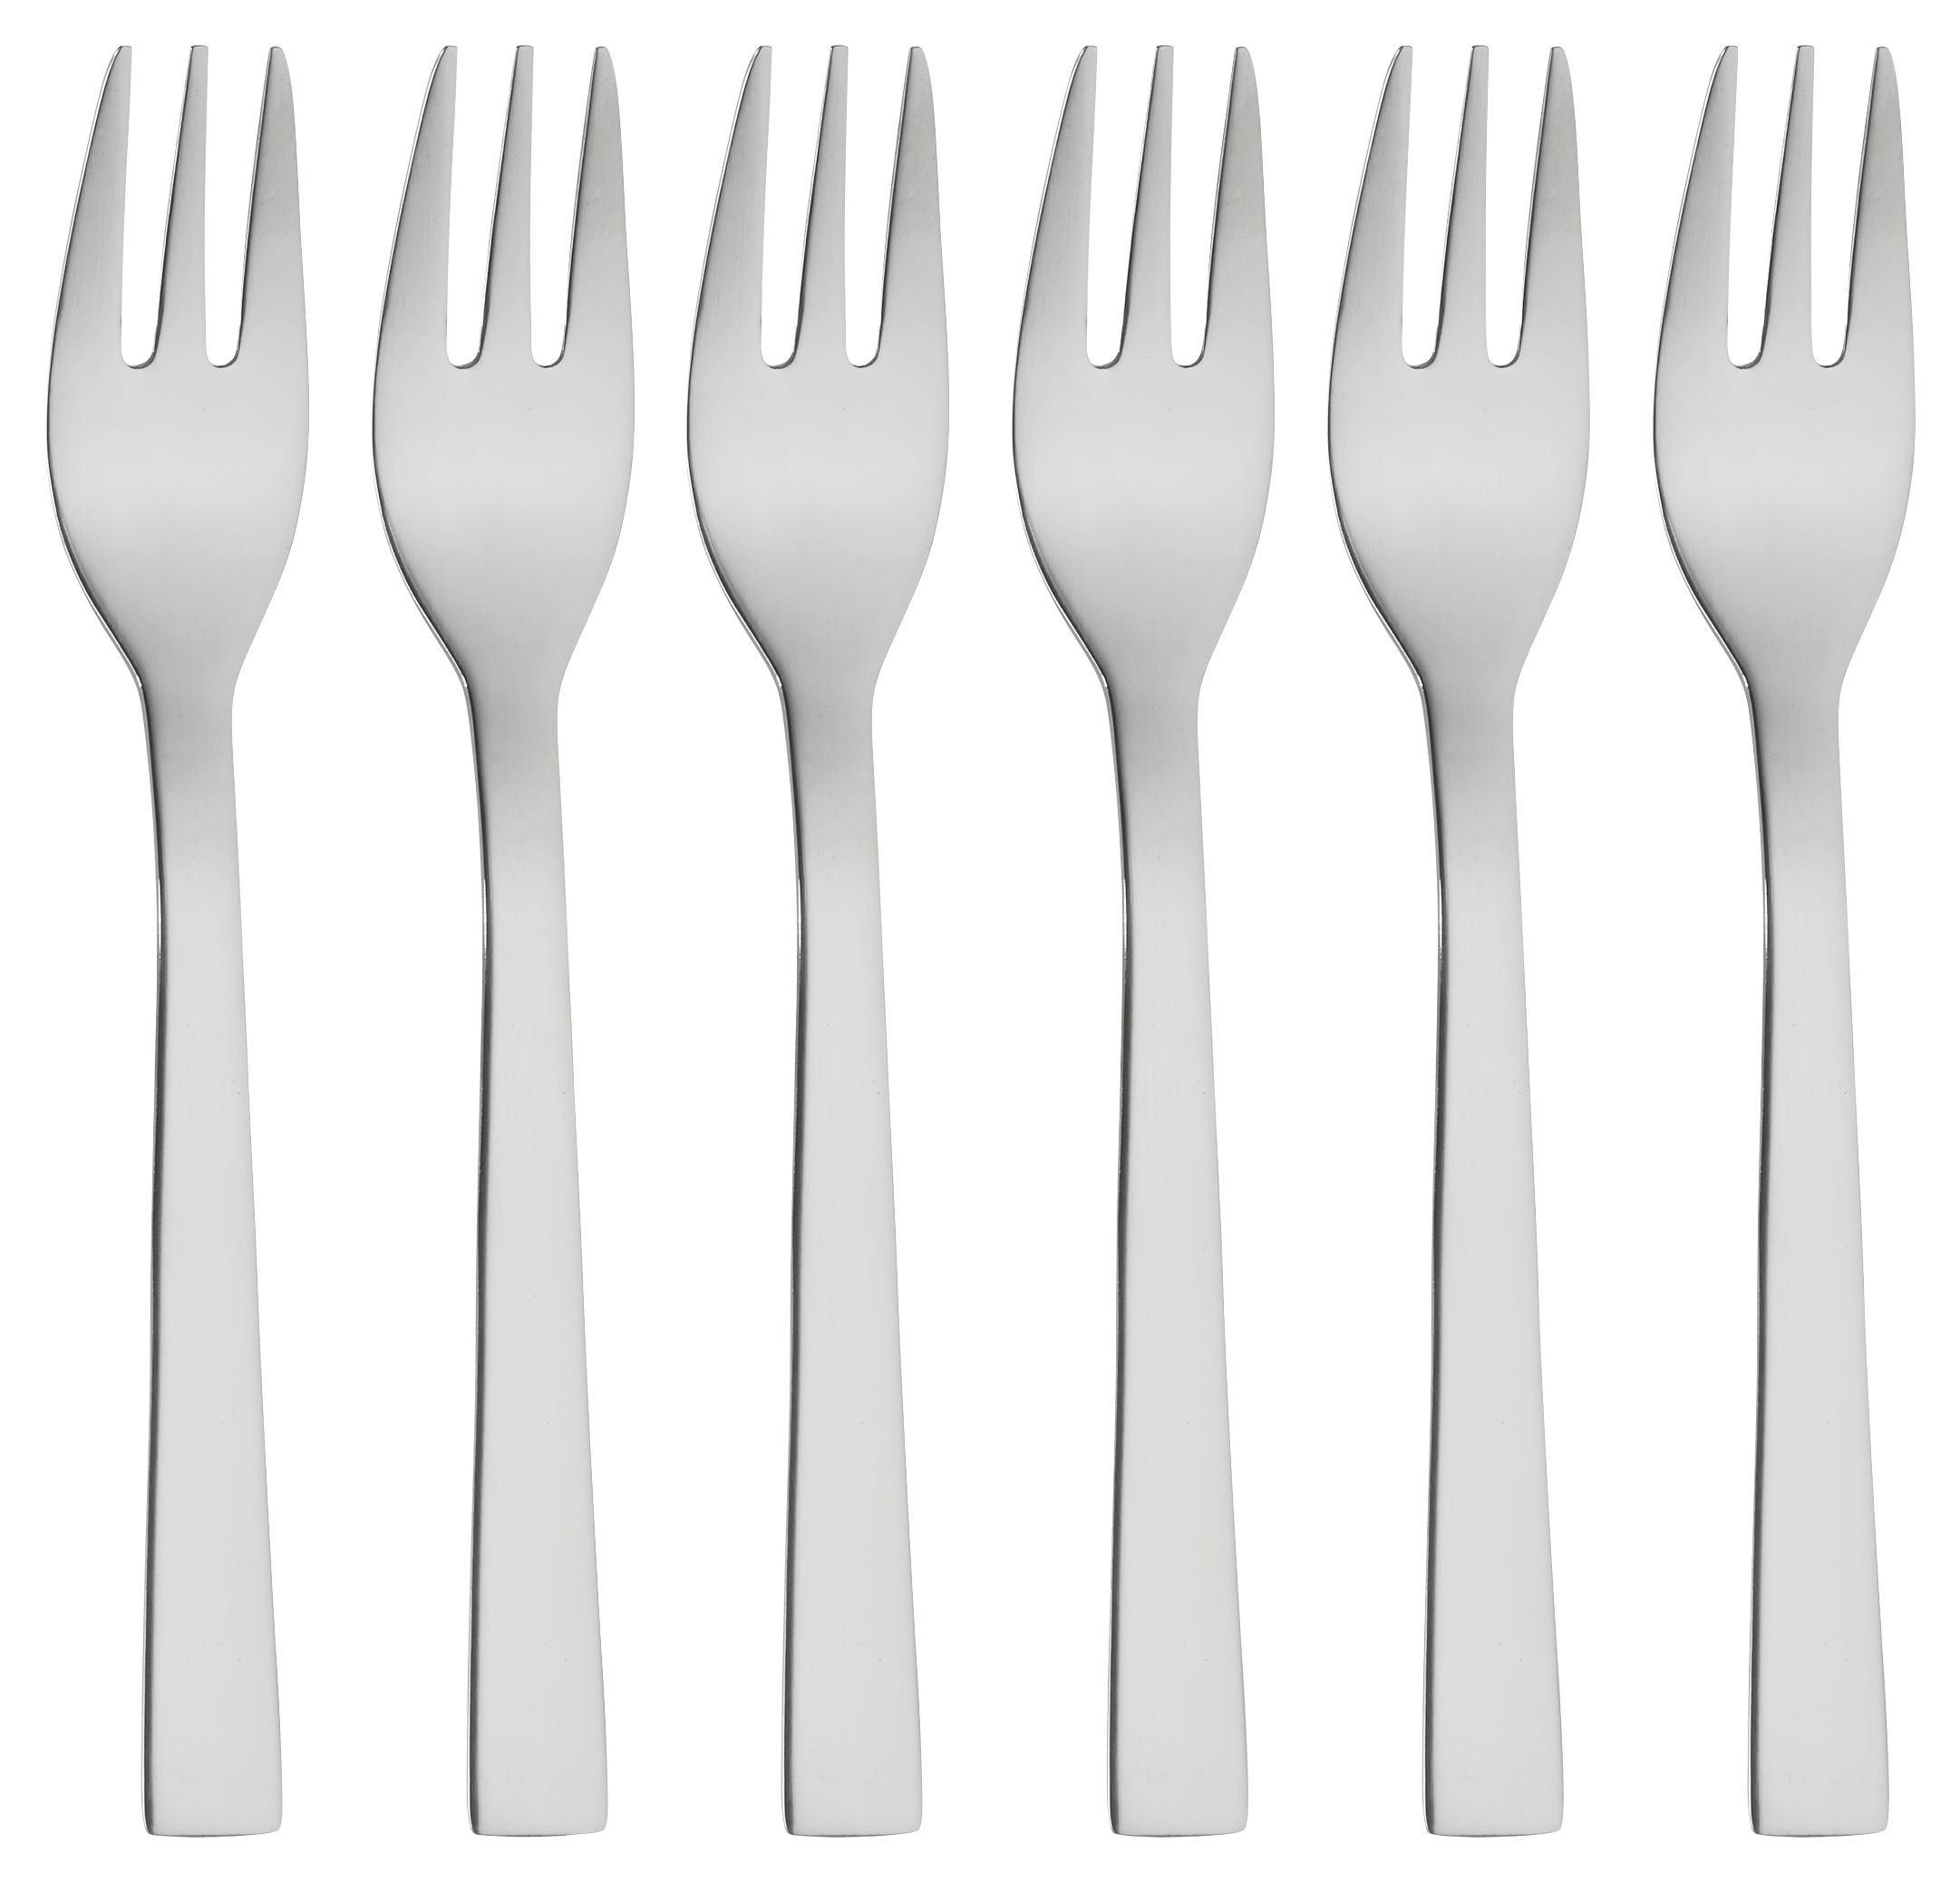 Vidlička Na Dezert Britt   6 Ks - barvy nerez oceli, Konvenční, kov - MÖMAX modern living